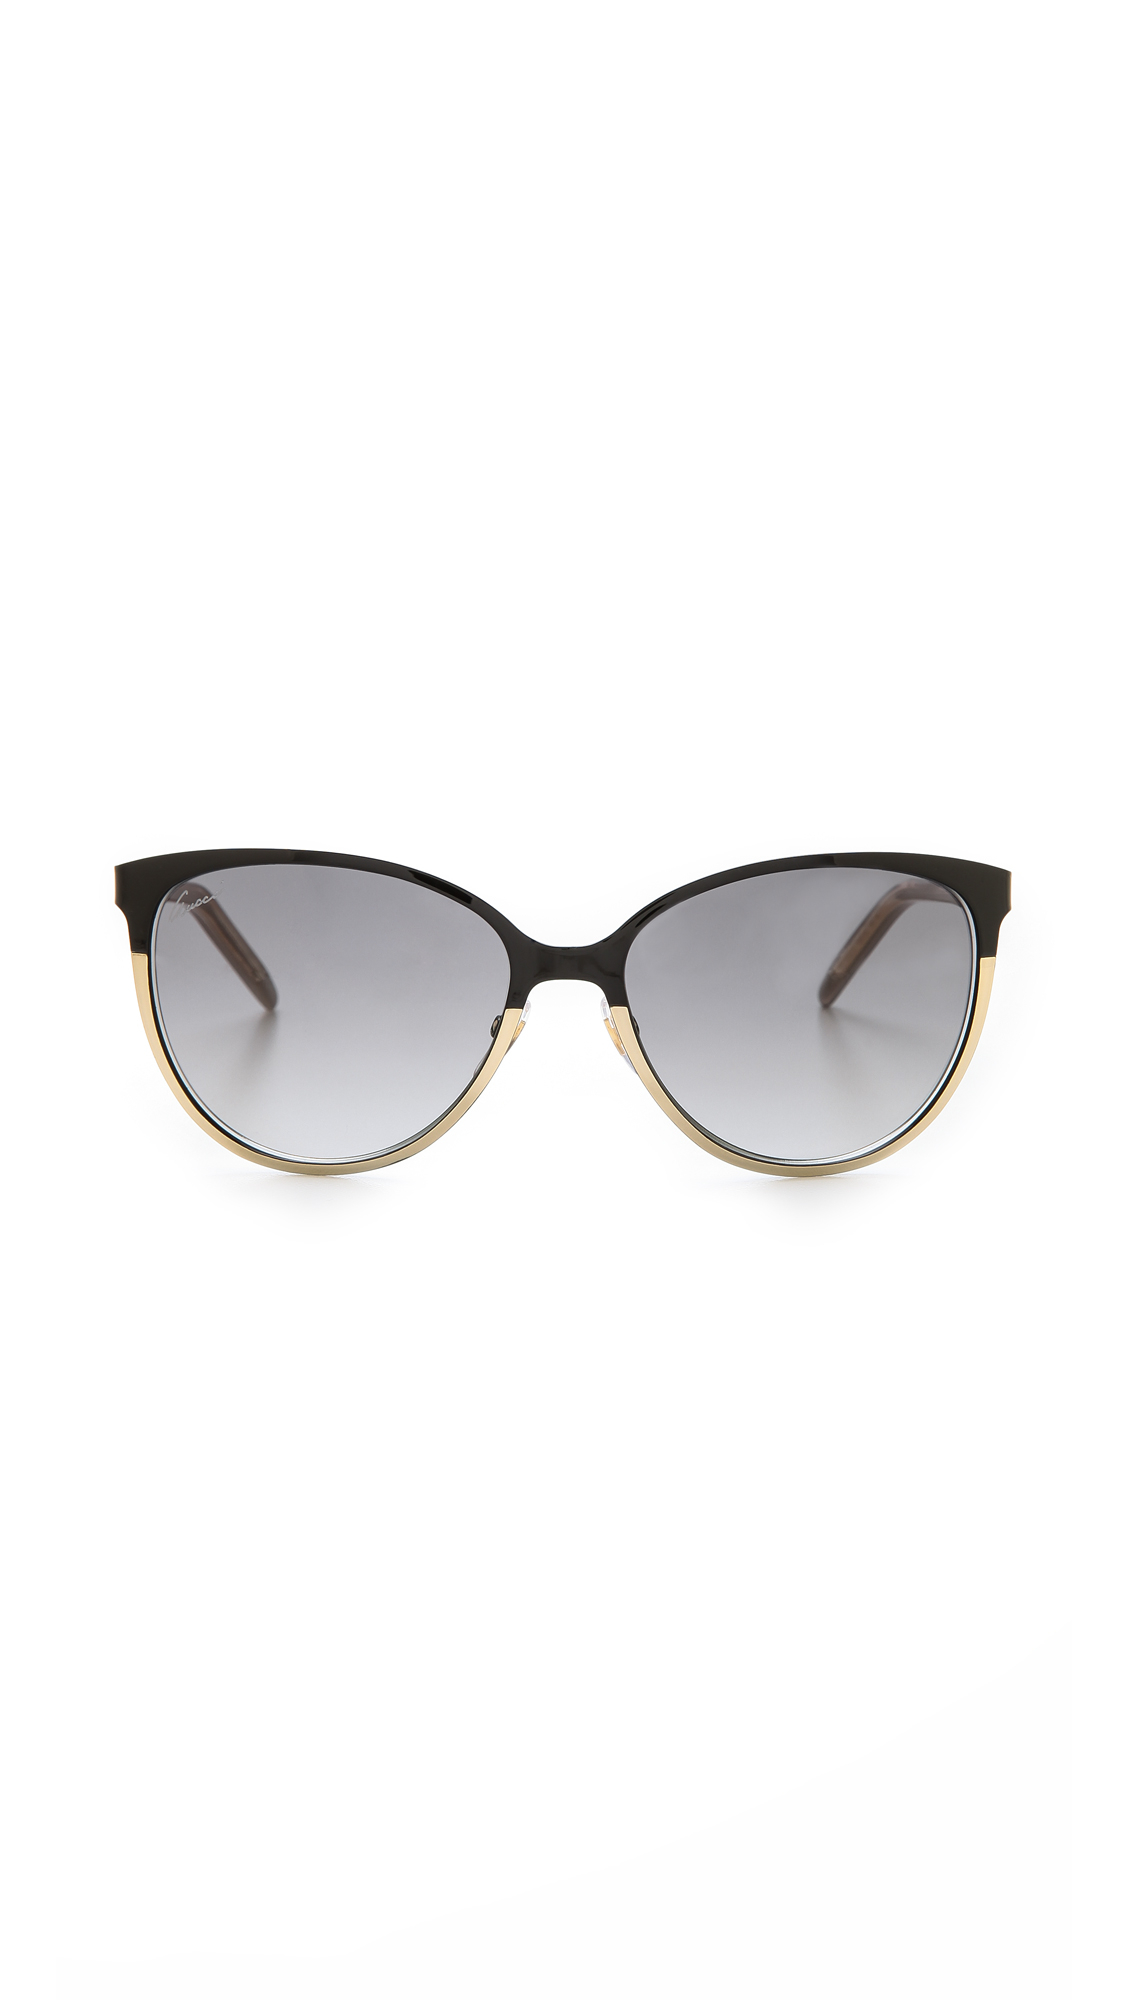 8ef606a409 Gucci Cat Eye Sunglasses Brown